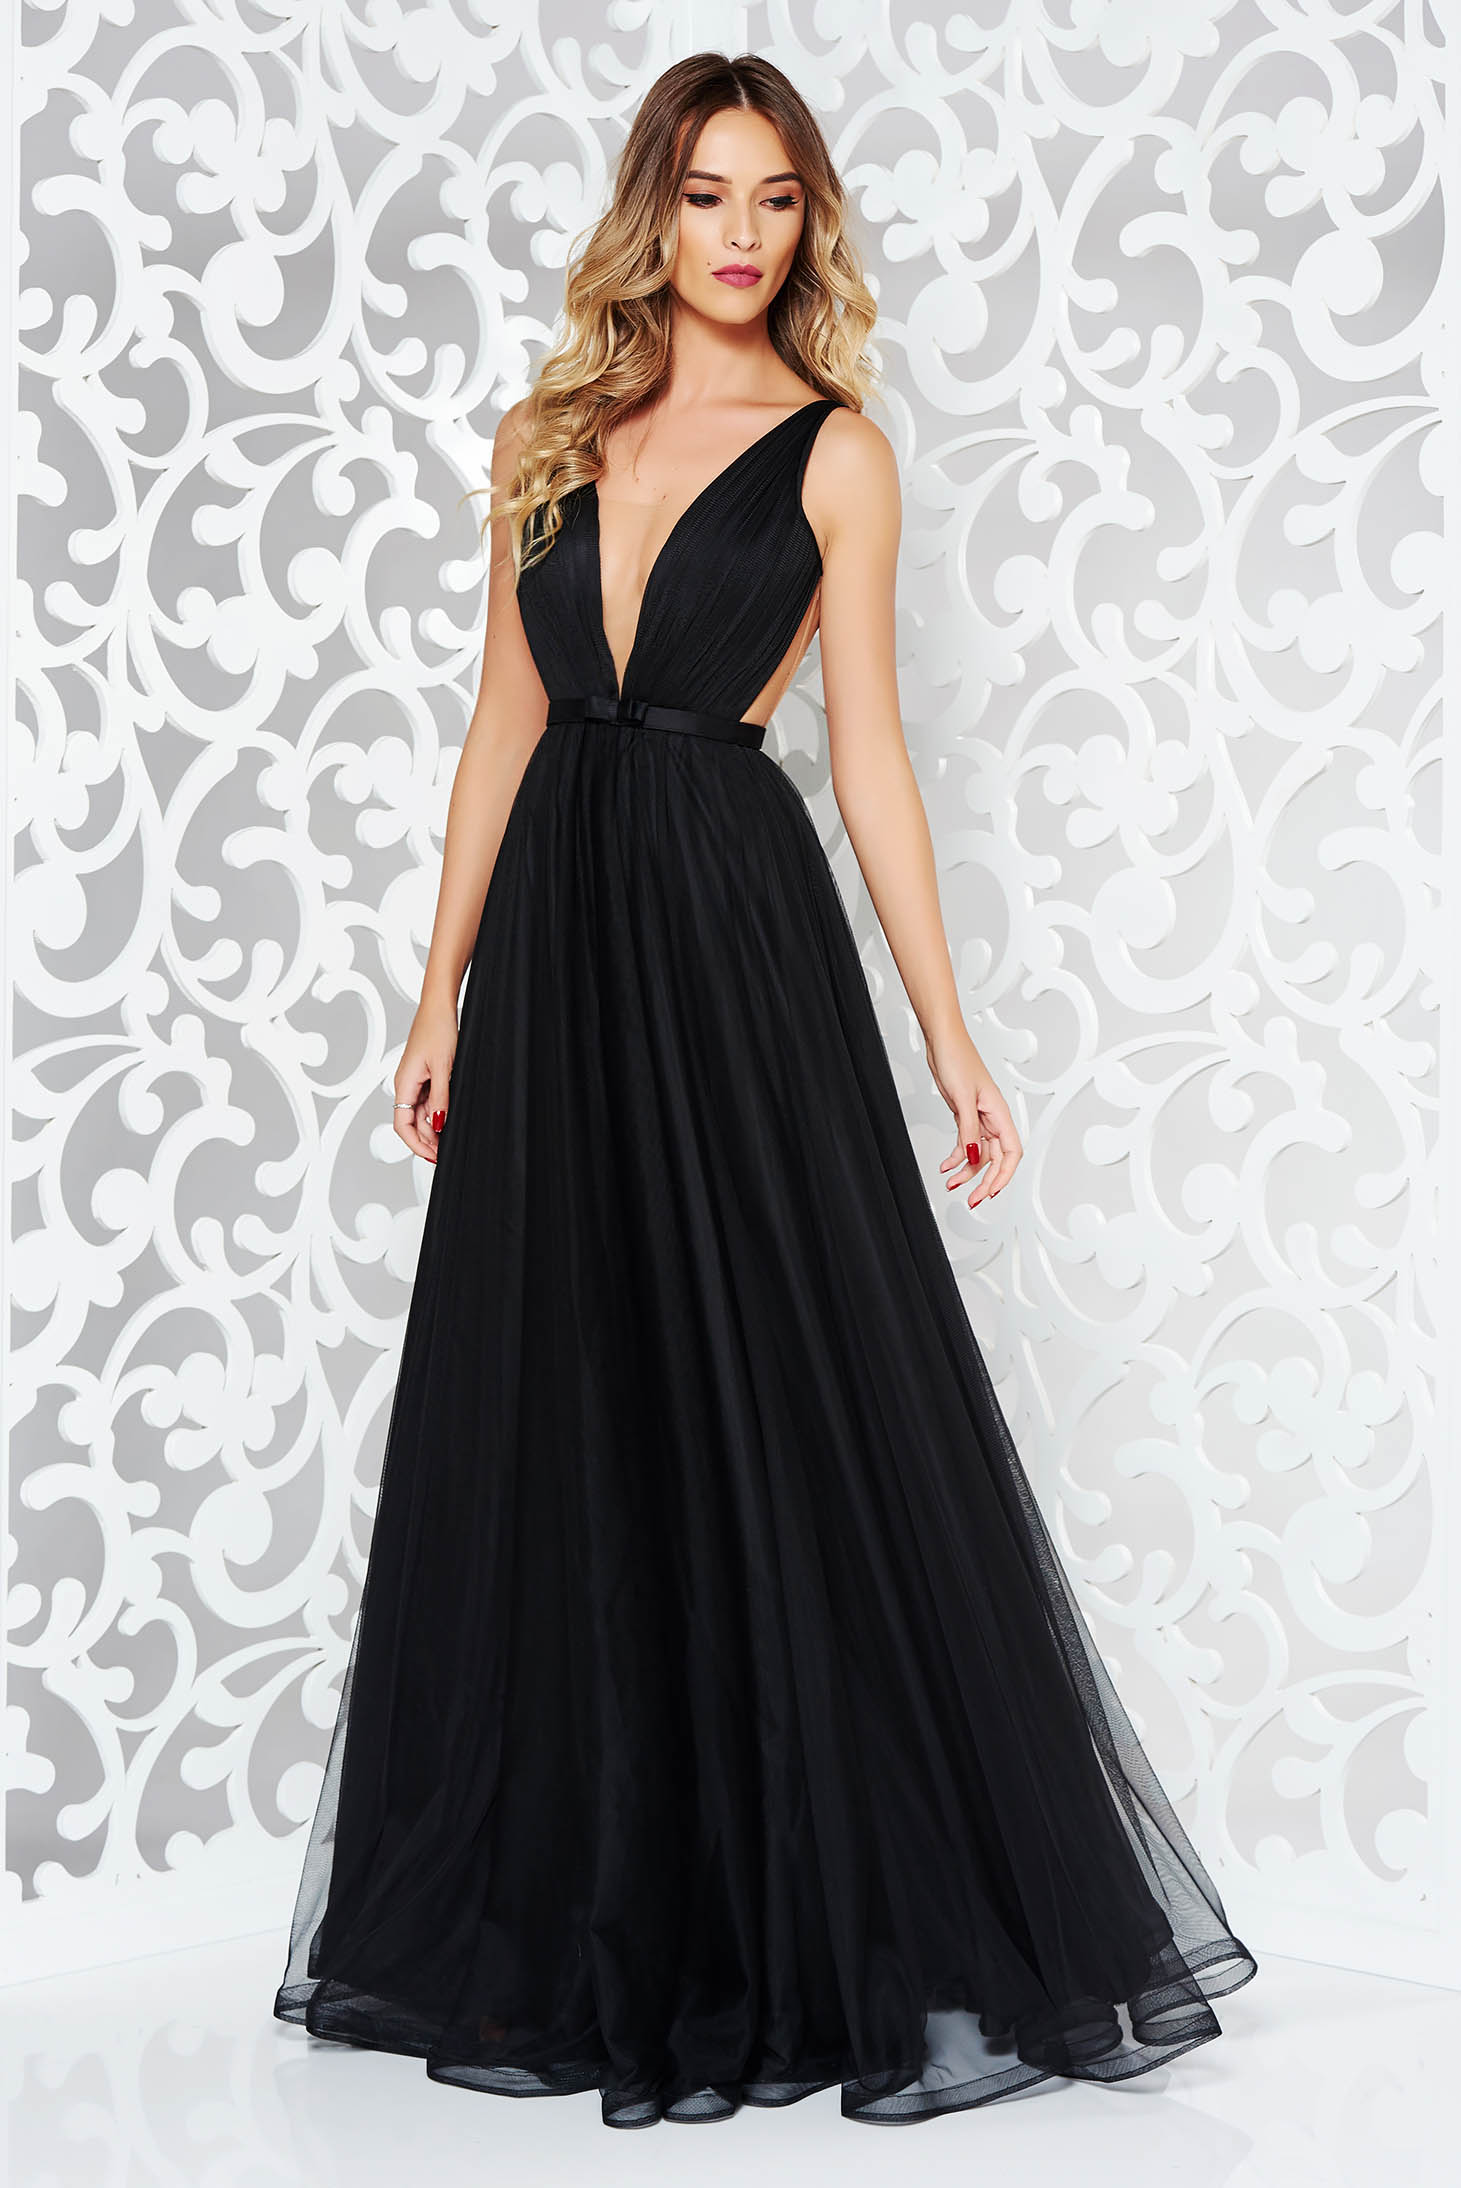 Ana Radu occasional net black dress with v-neckline bow accessory